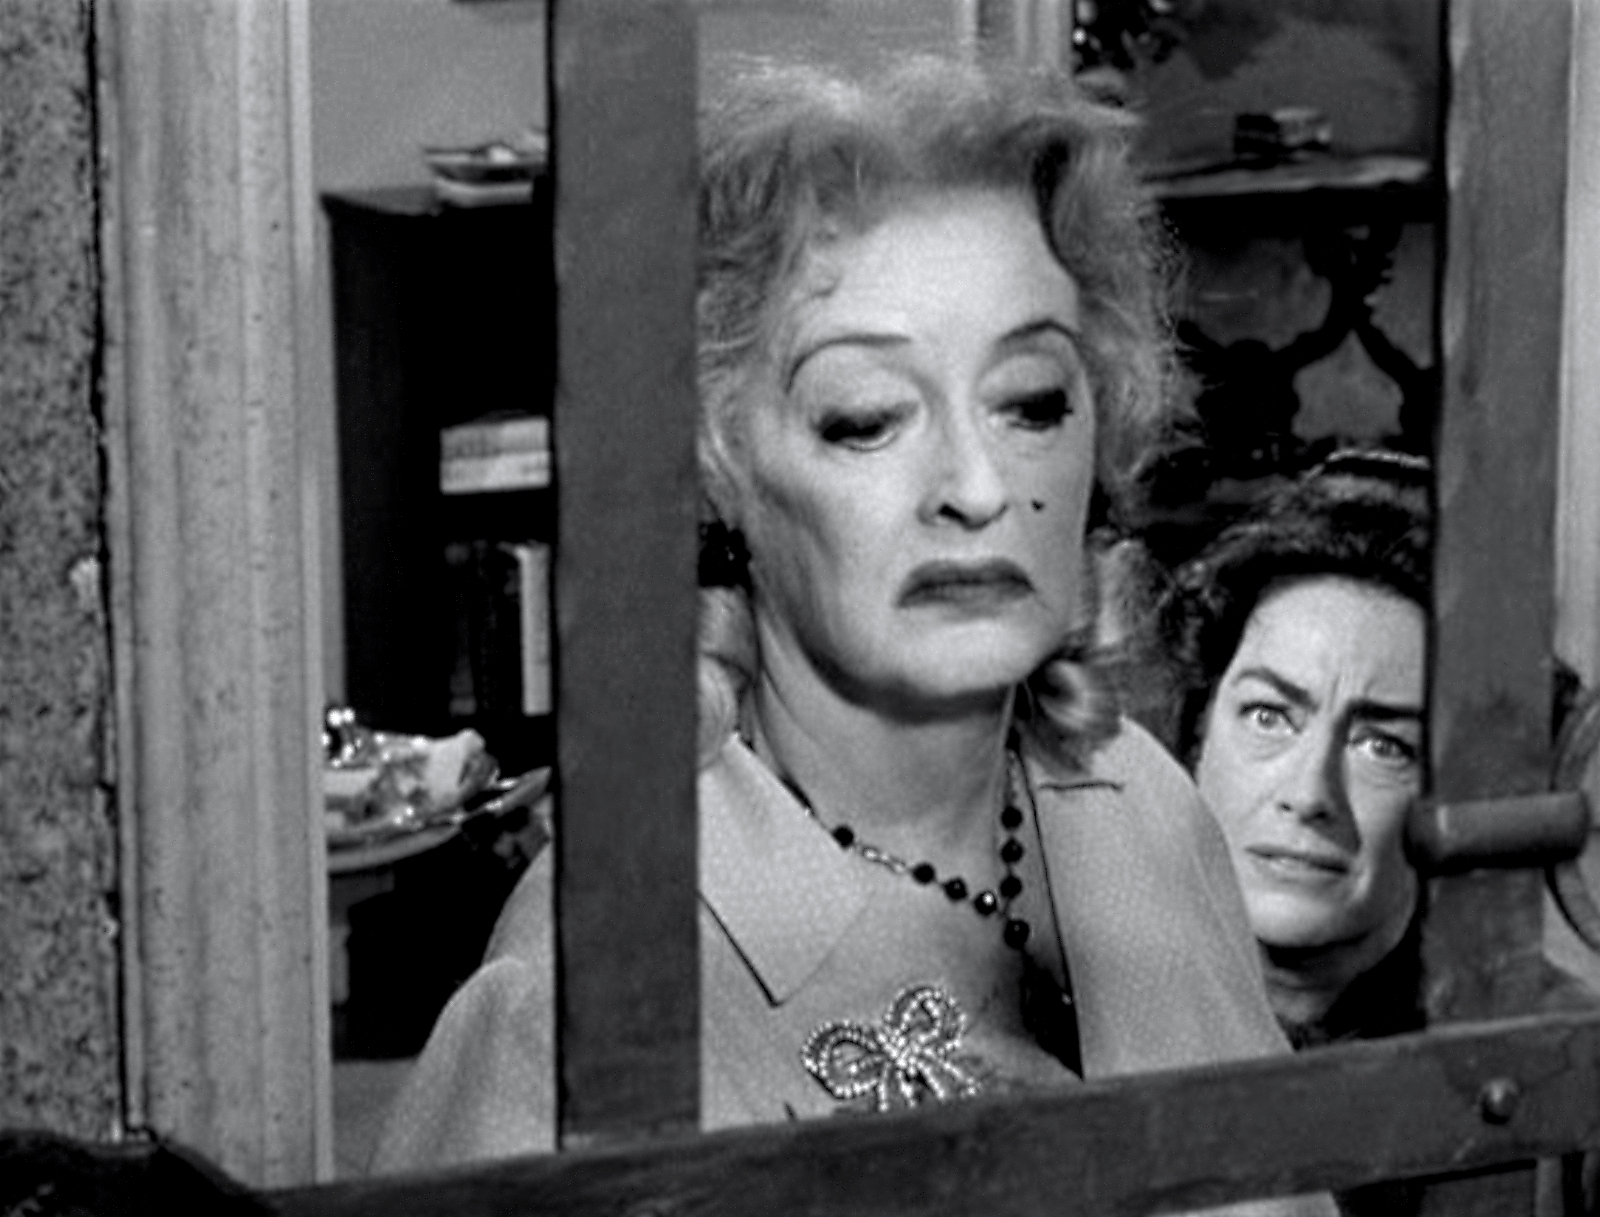 Betty and Joan Baby Jane?